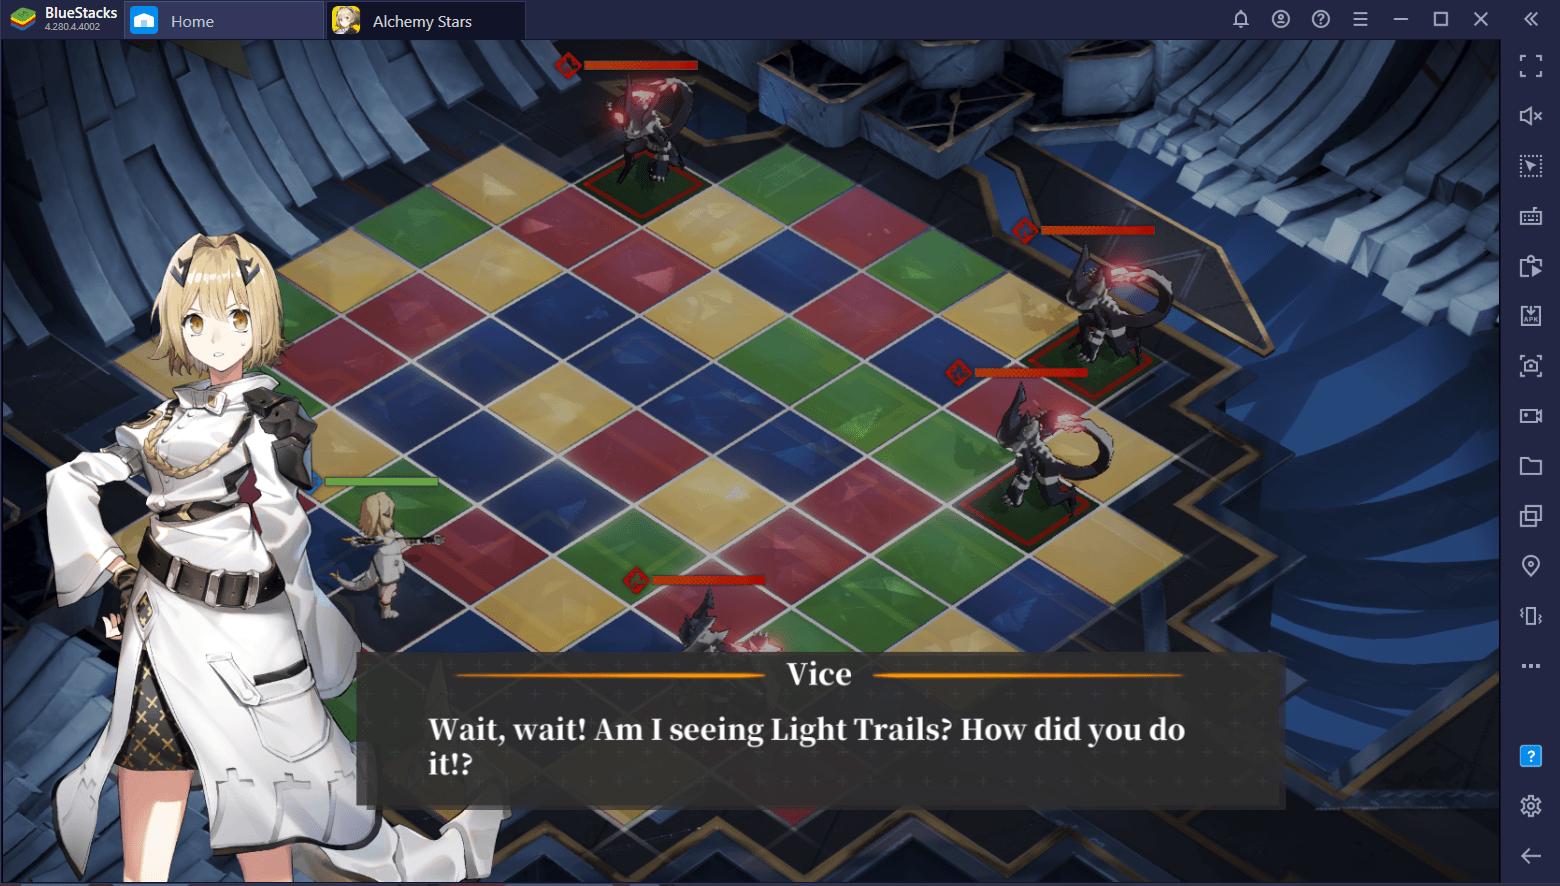 Cara Bermain Alchemy Stars via BlueStacks di PC!